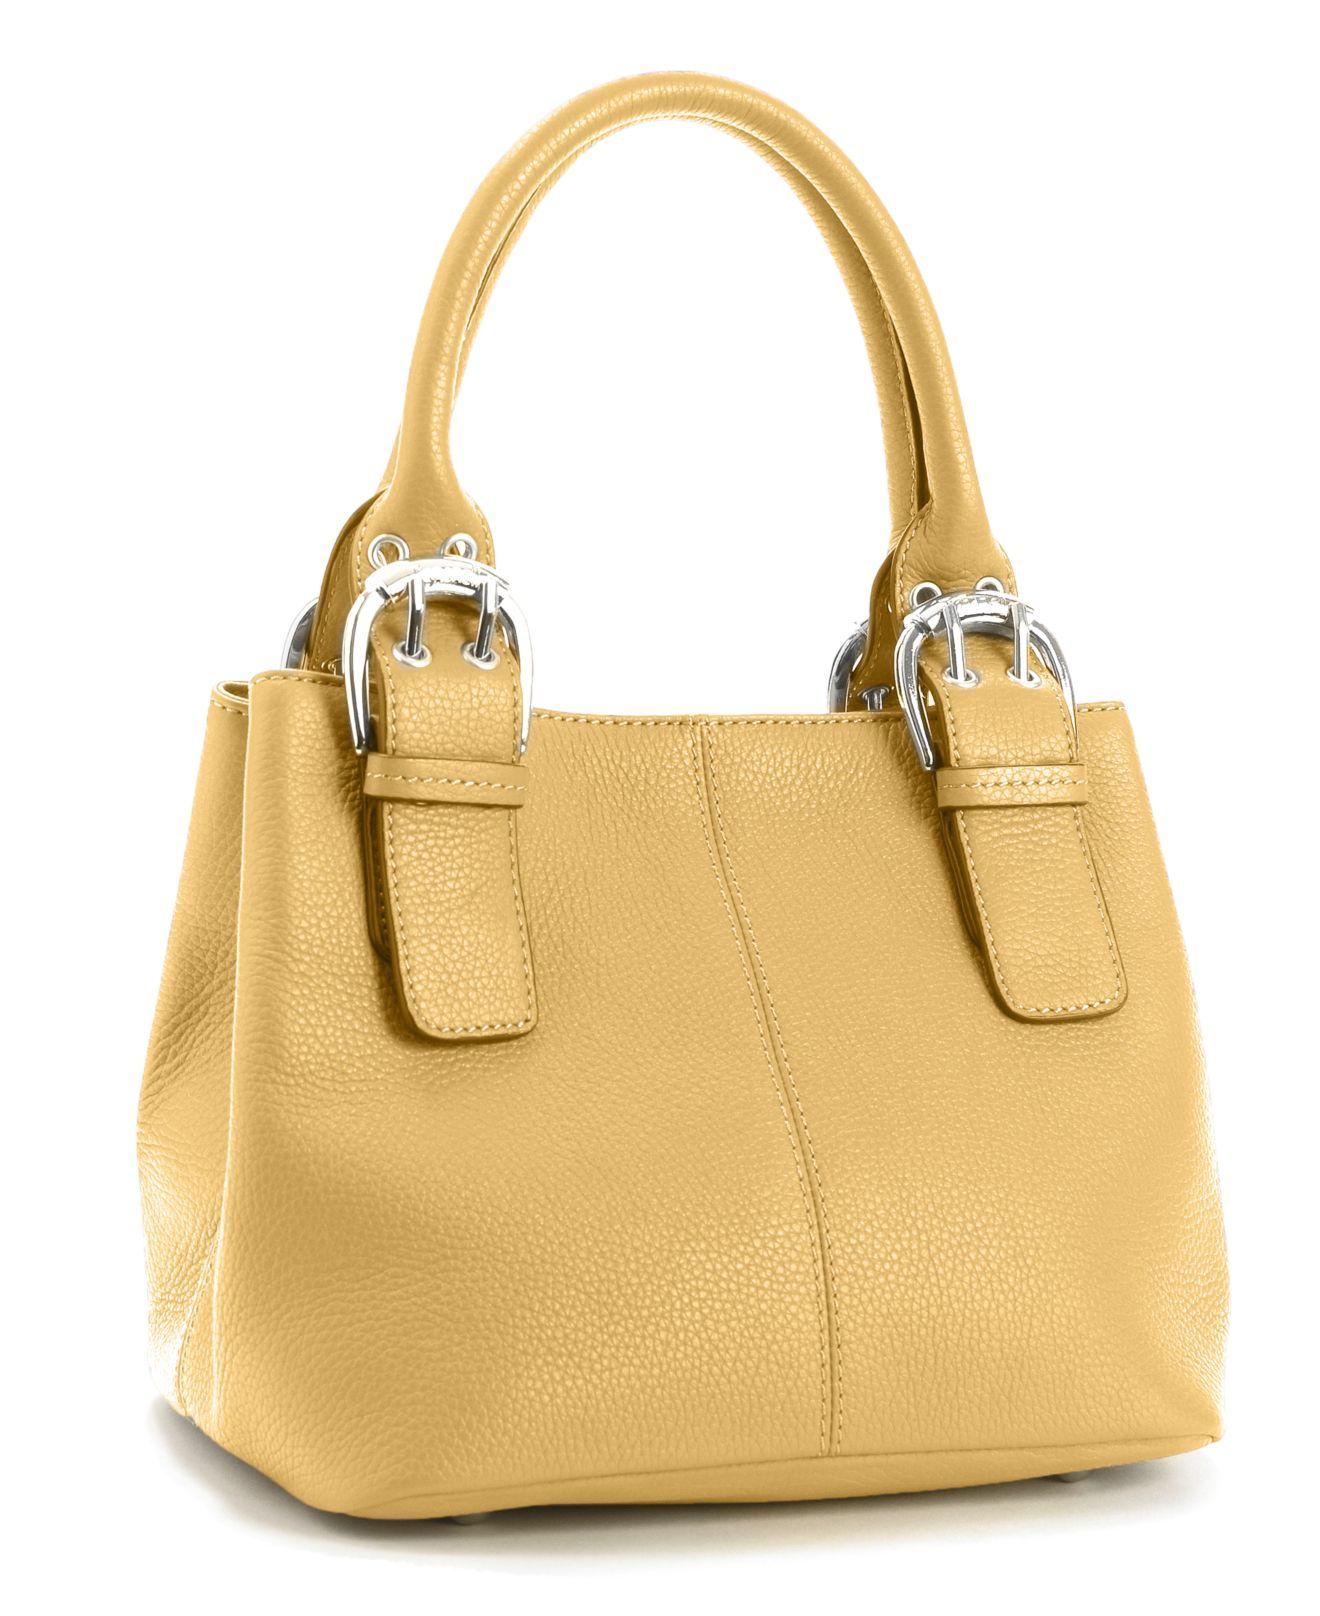 0ed05d74be Tignanello Handbag